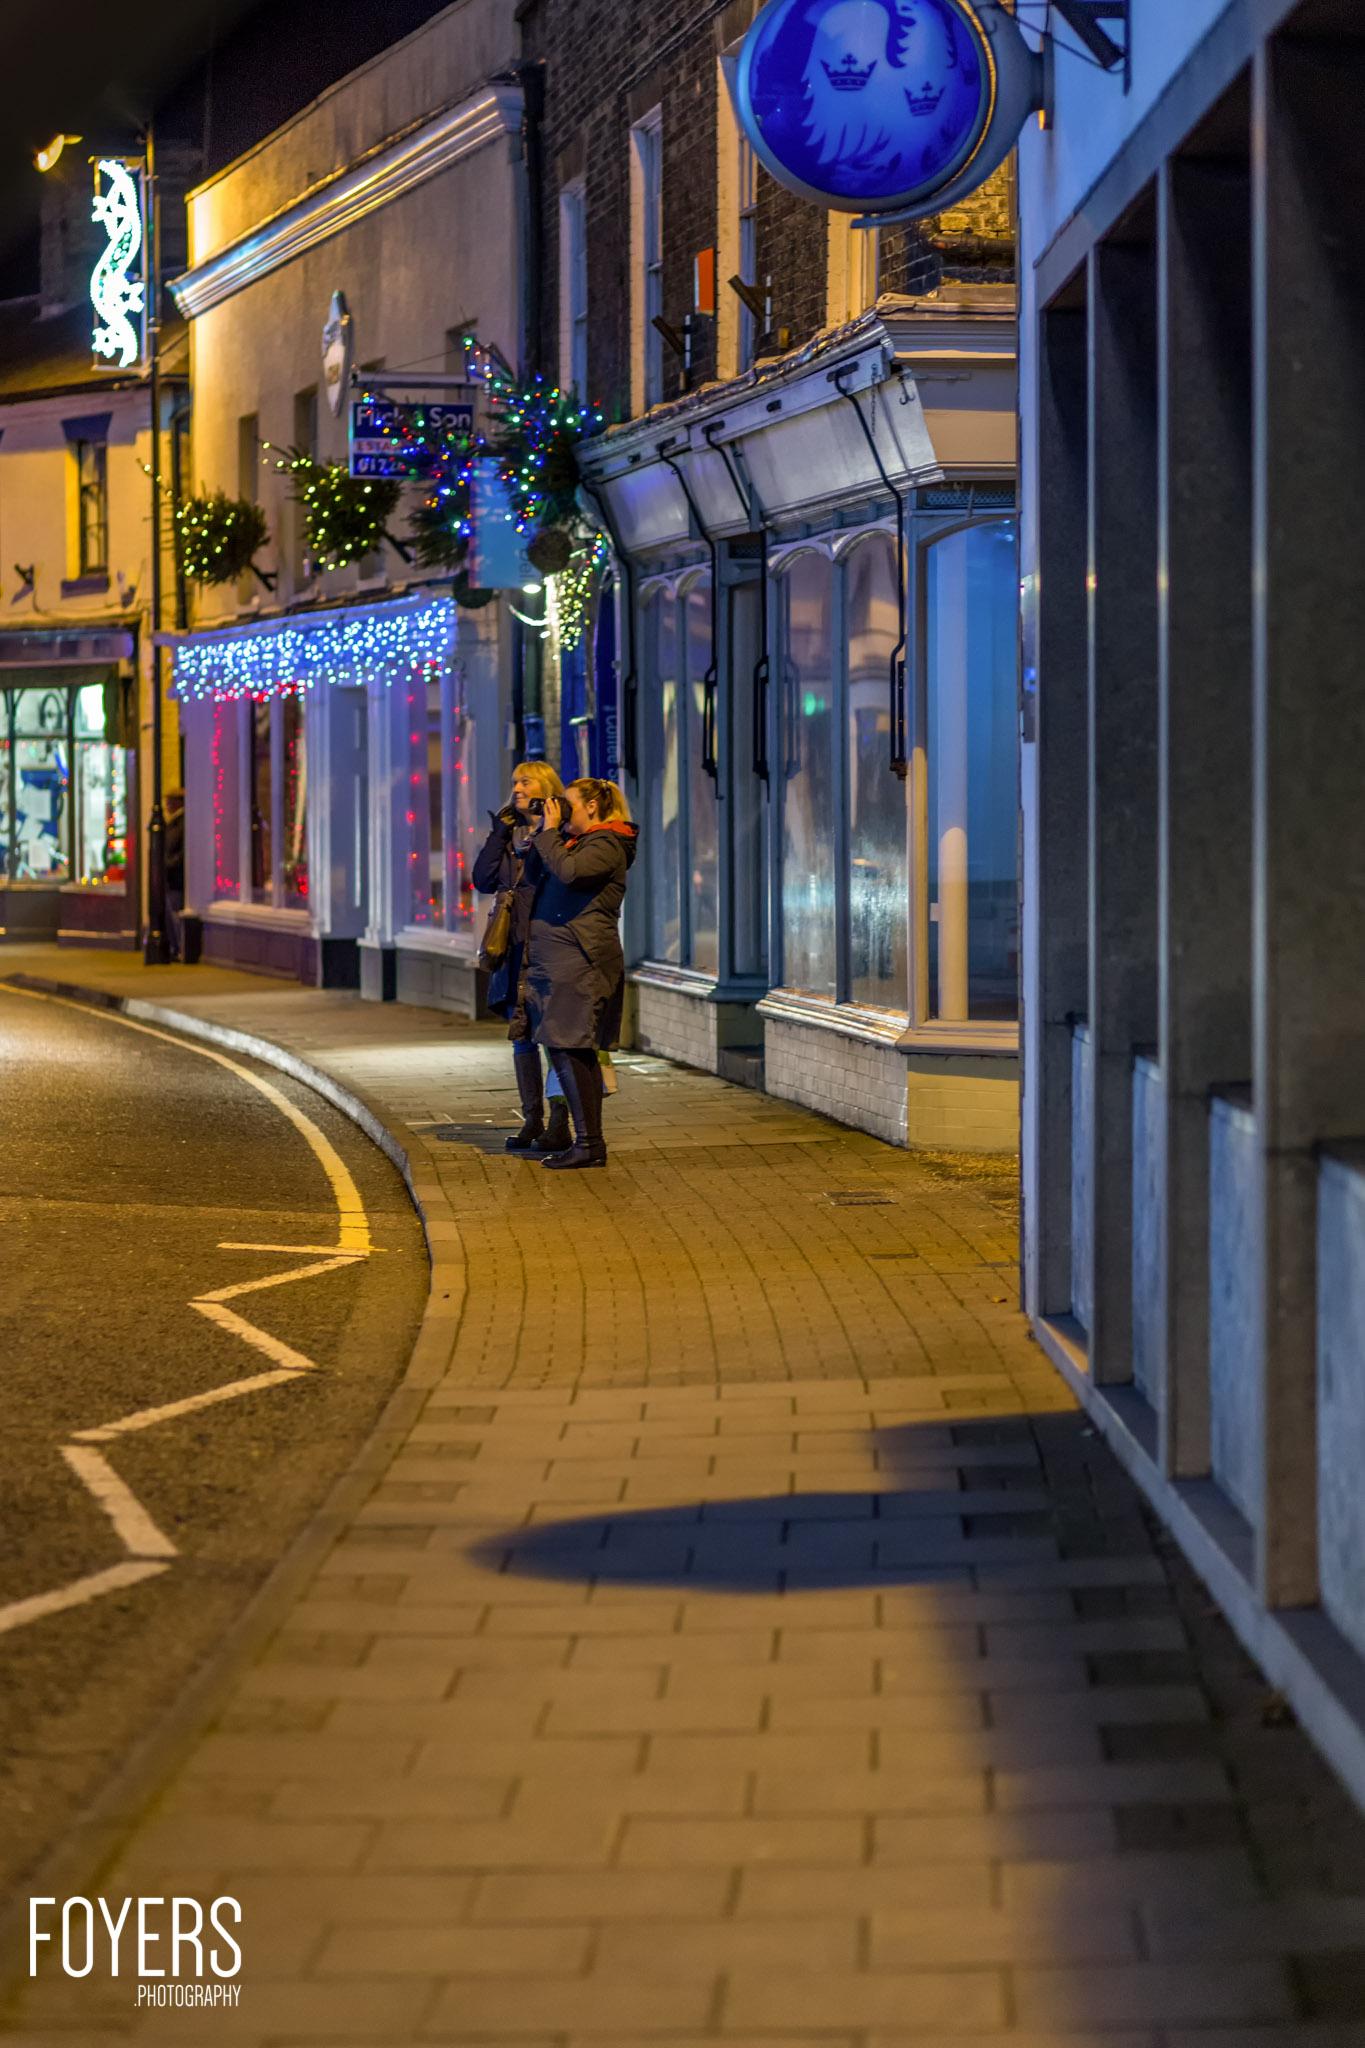 Saxmundham chrsitmas lights-1- Saxmundham Chrsitmas lights-1 - Robert Foyers-2